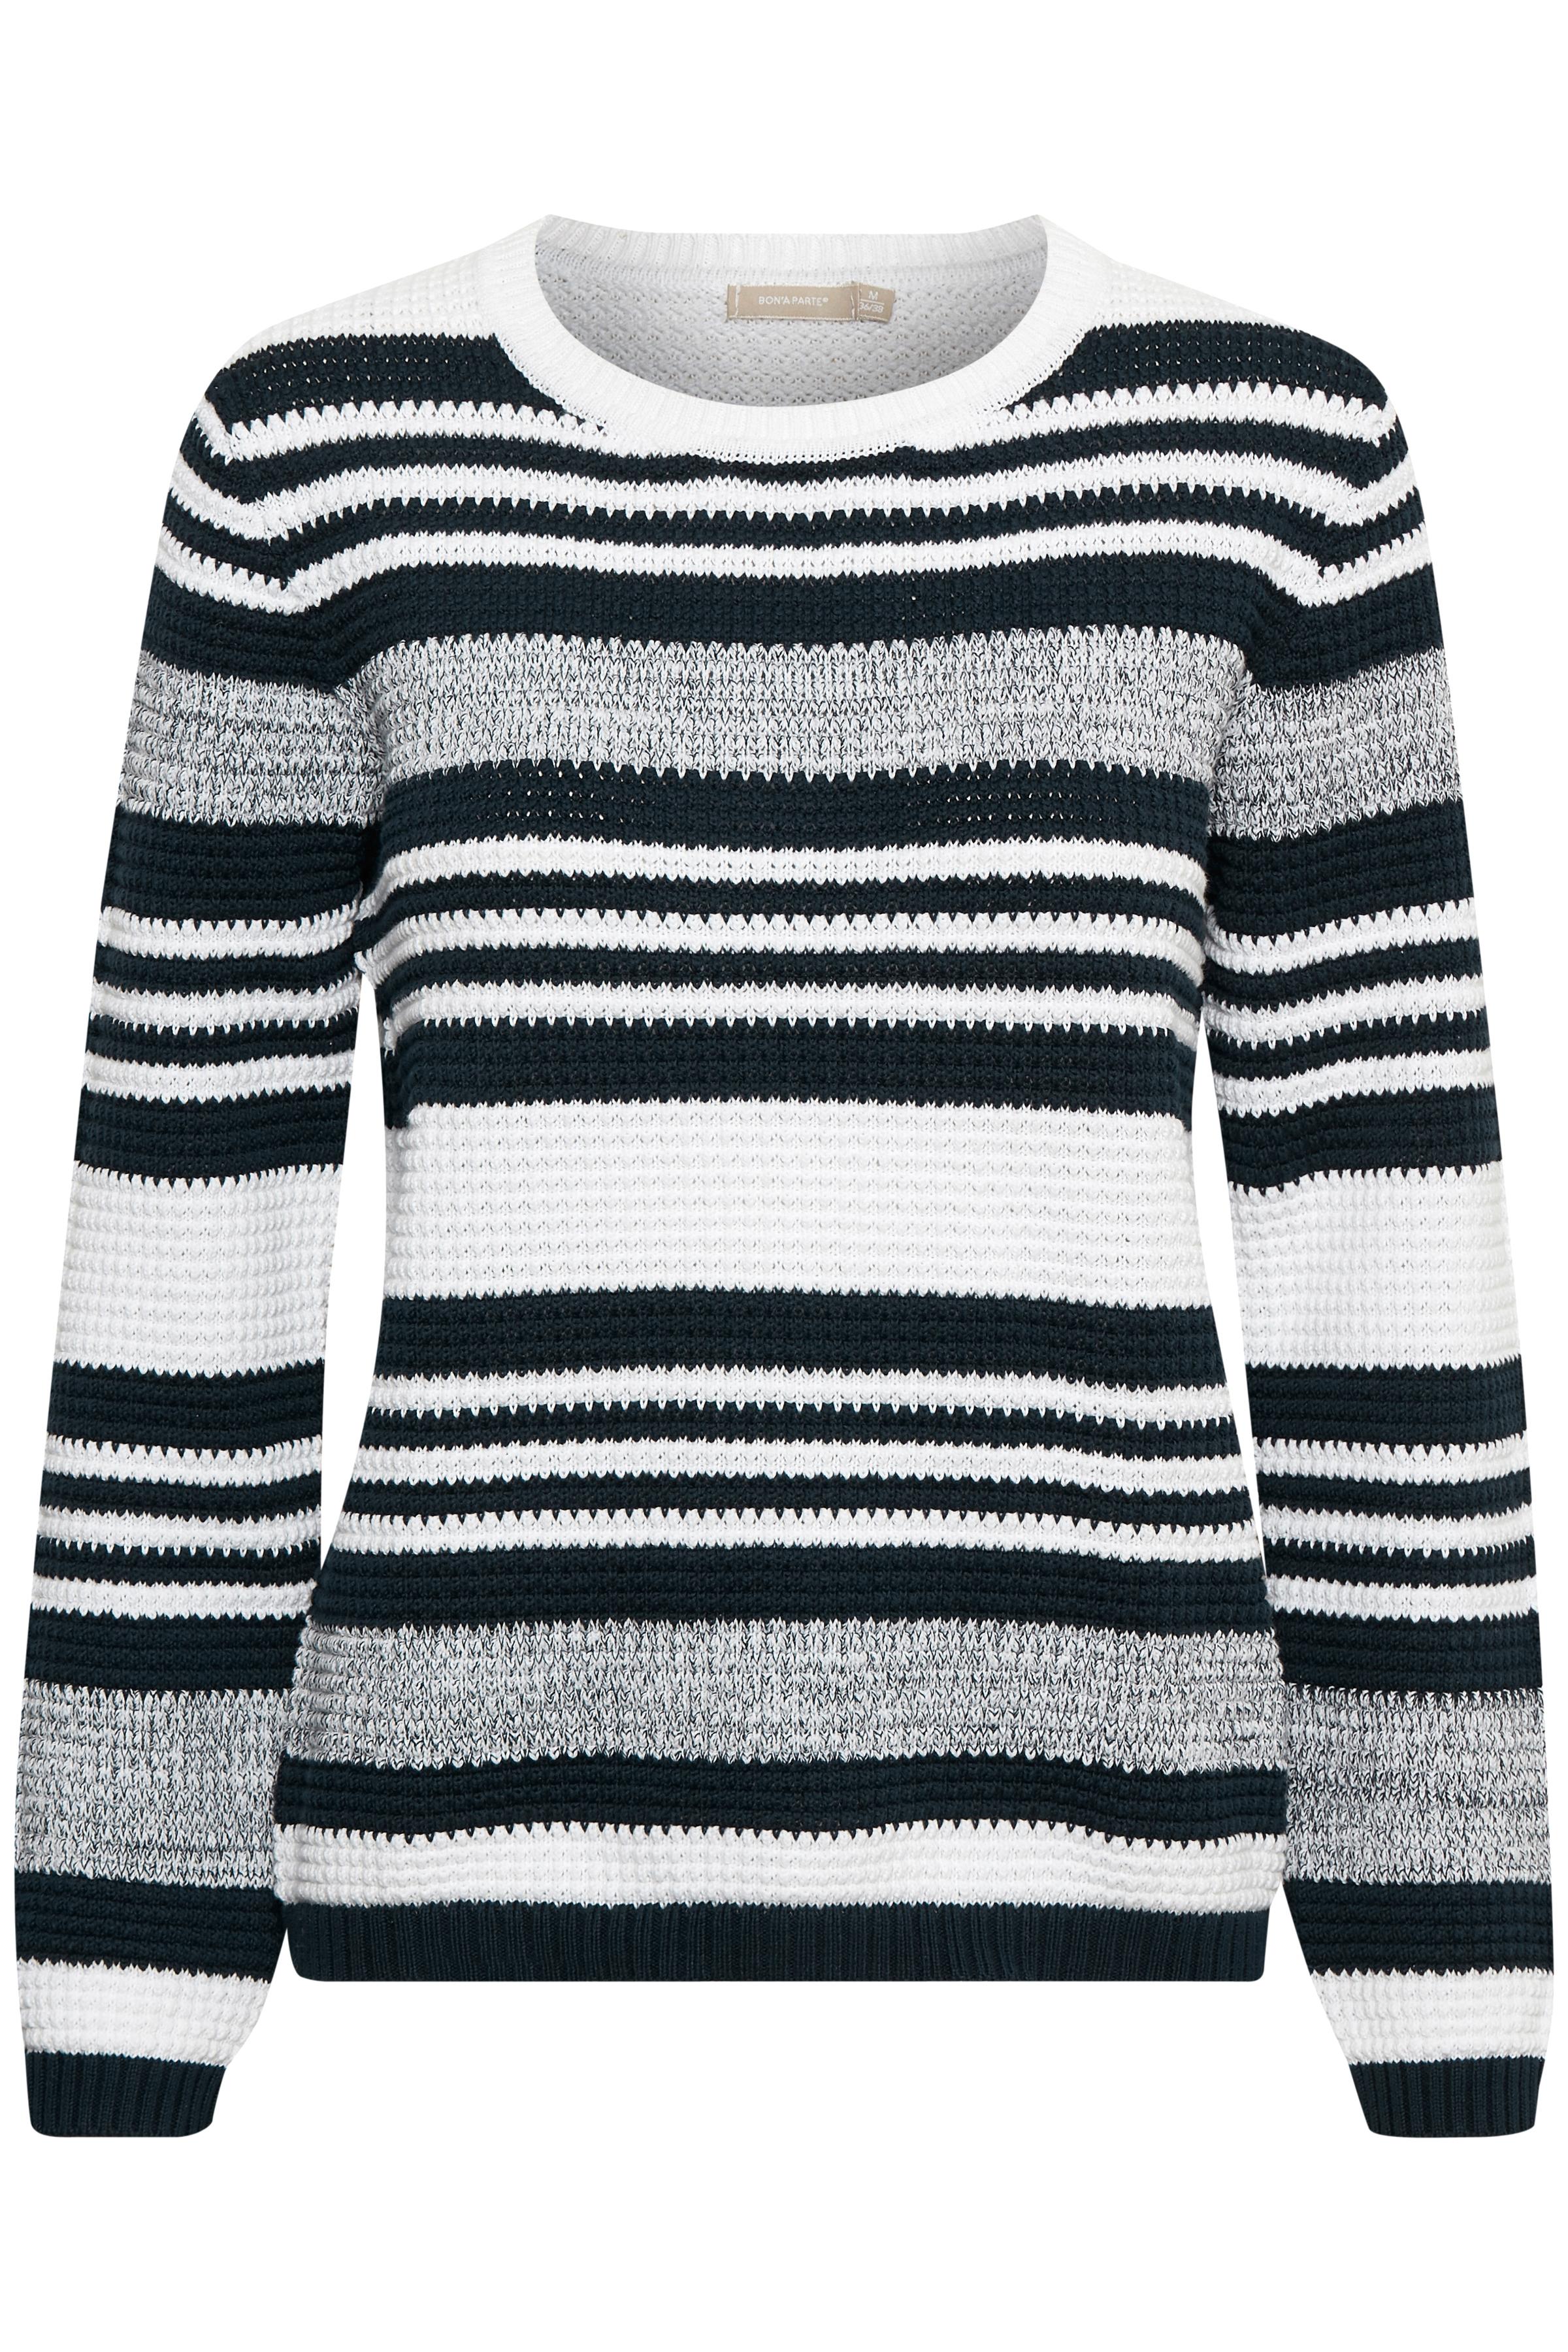 BonA Parte Dame Strikket sweatshirt - Marineblå/off-white